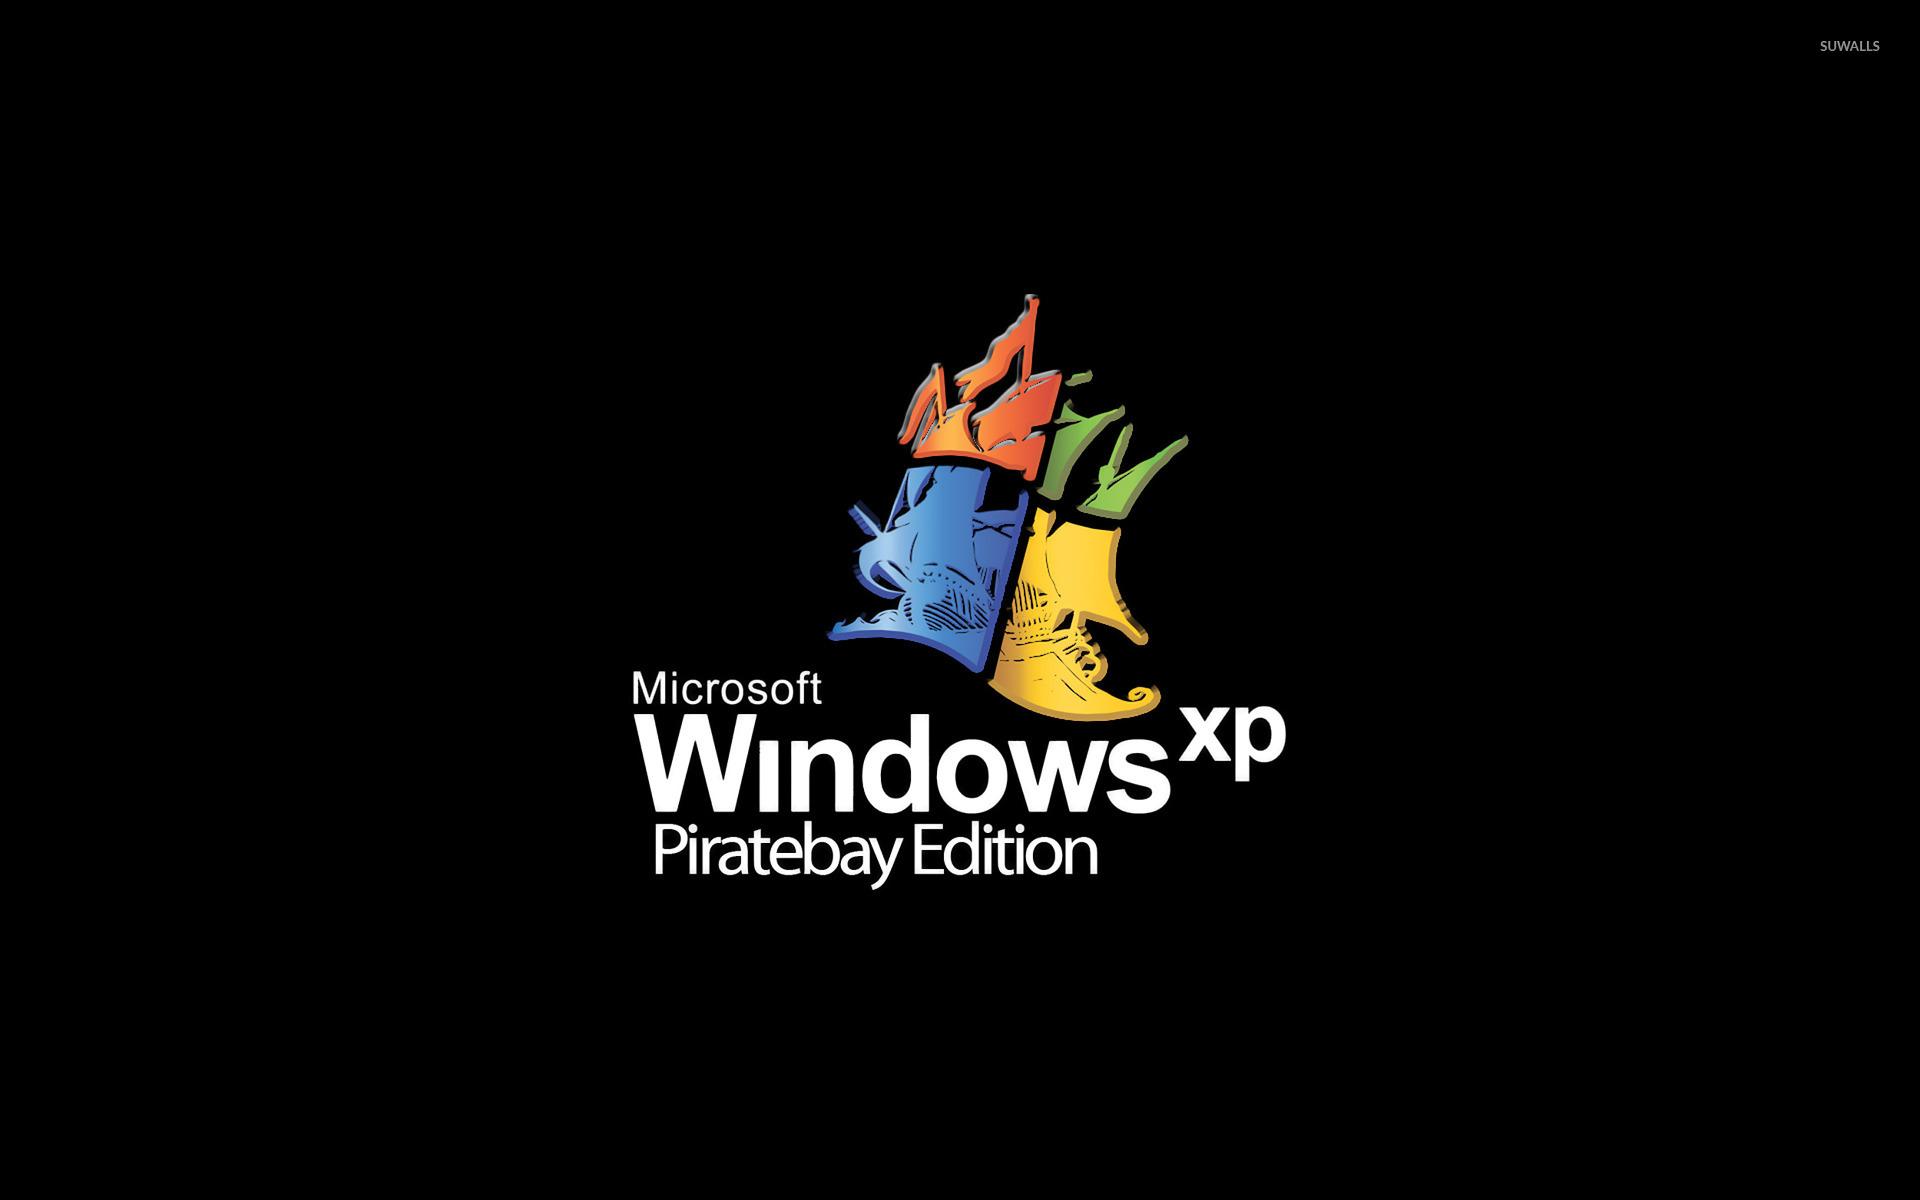 windows xp wallpaper - computer wallpapers - #93